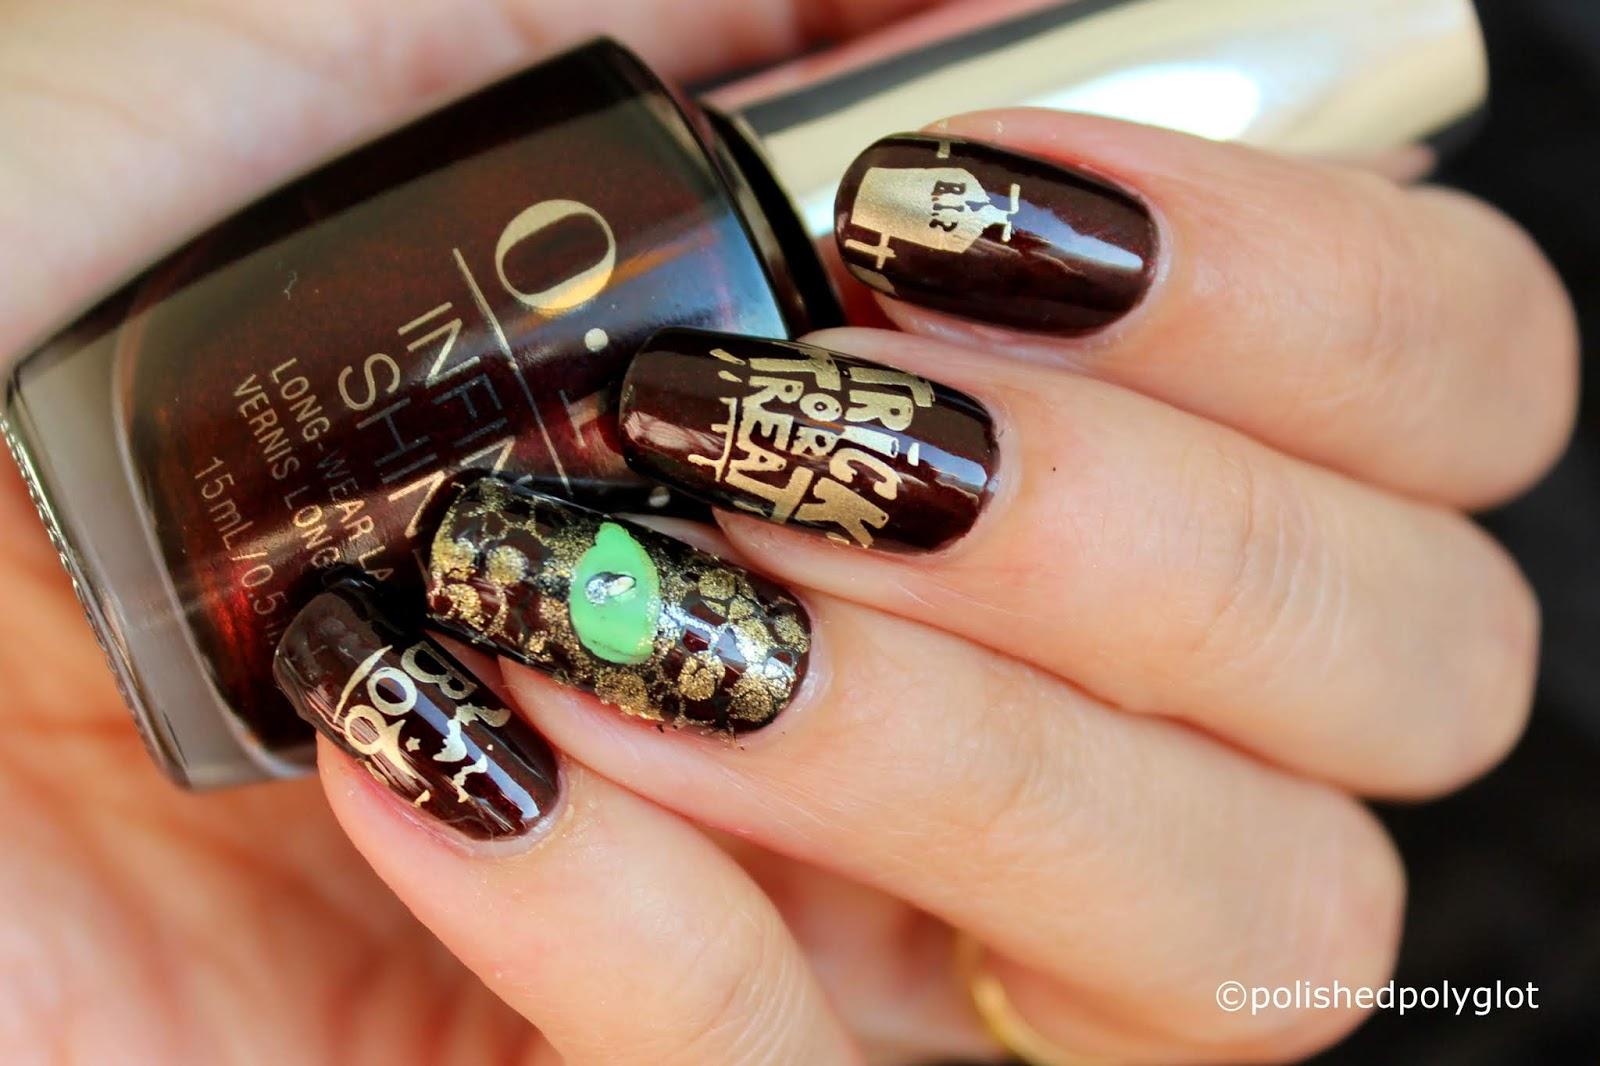 nail art │ vampy nails for halloween / polished polyglot